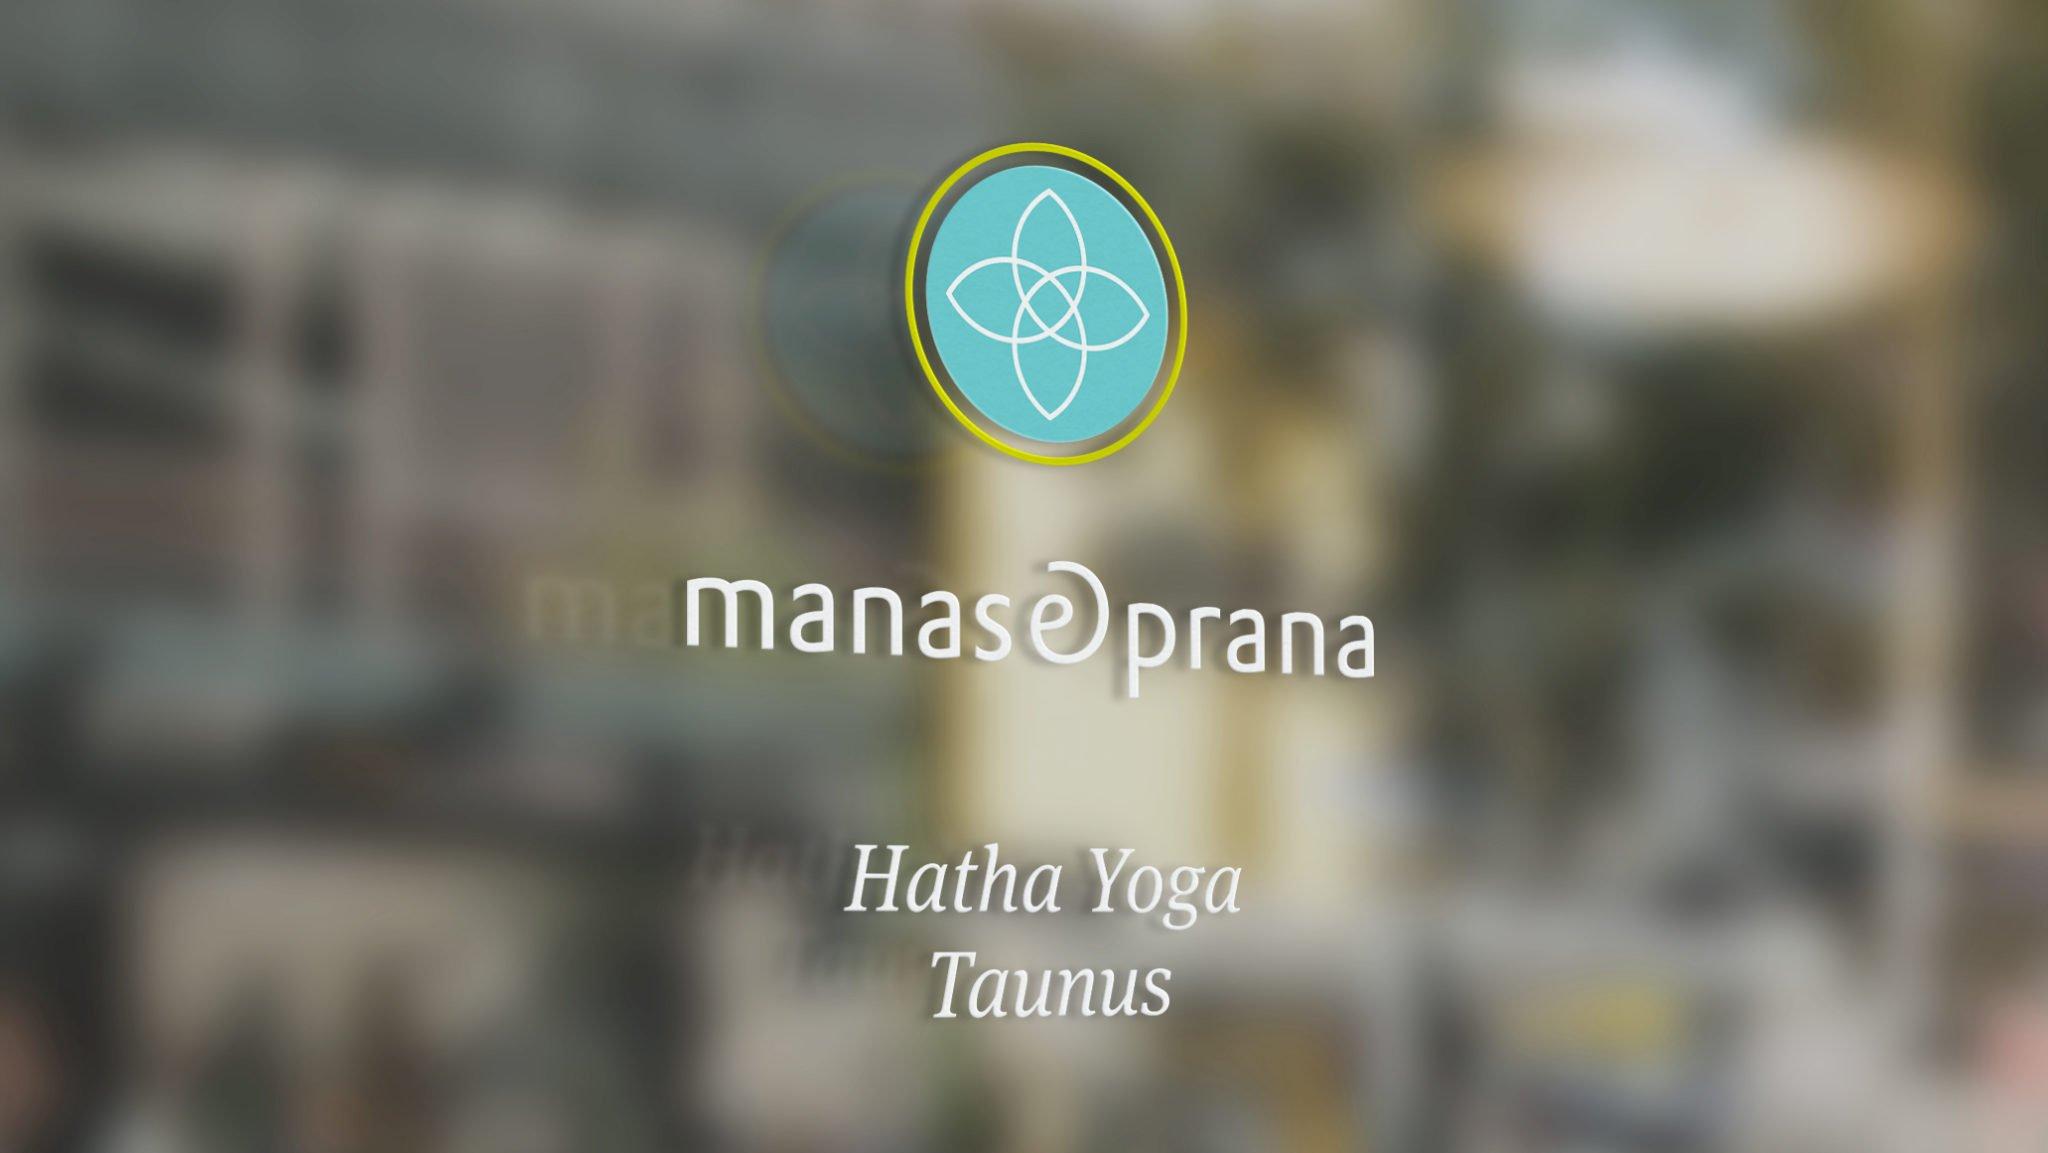 Manas Prana Hatha Yoga Studio Minibrand